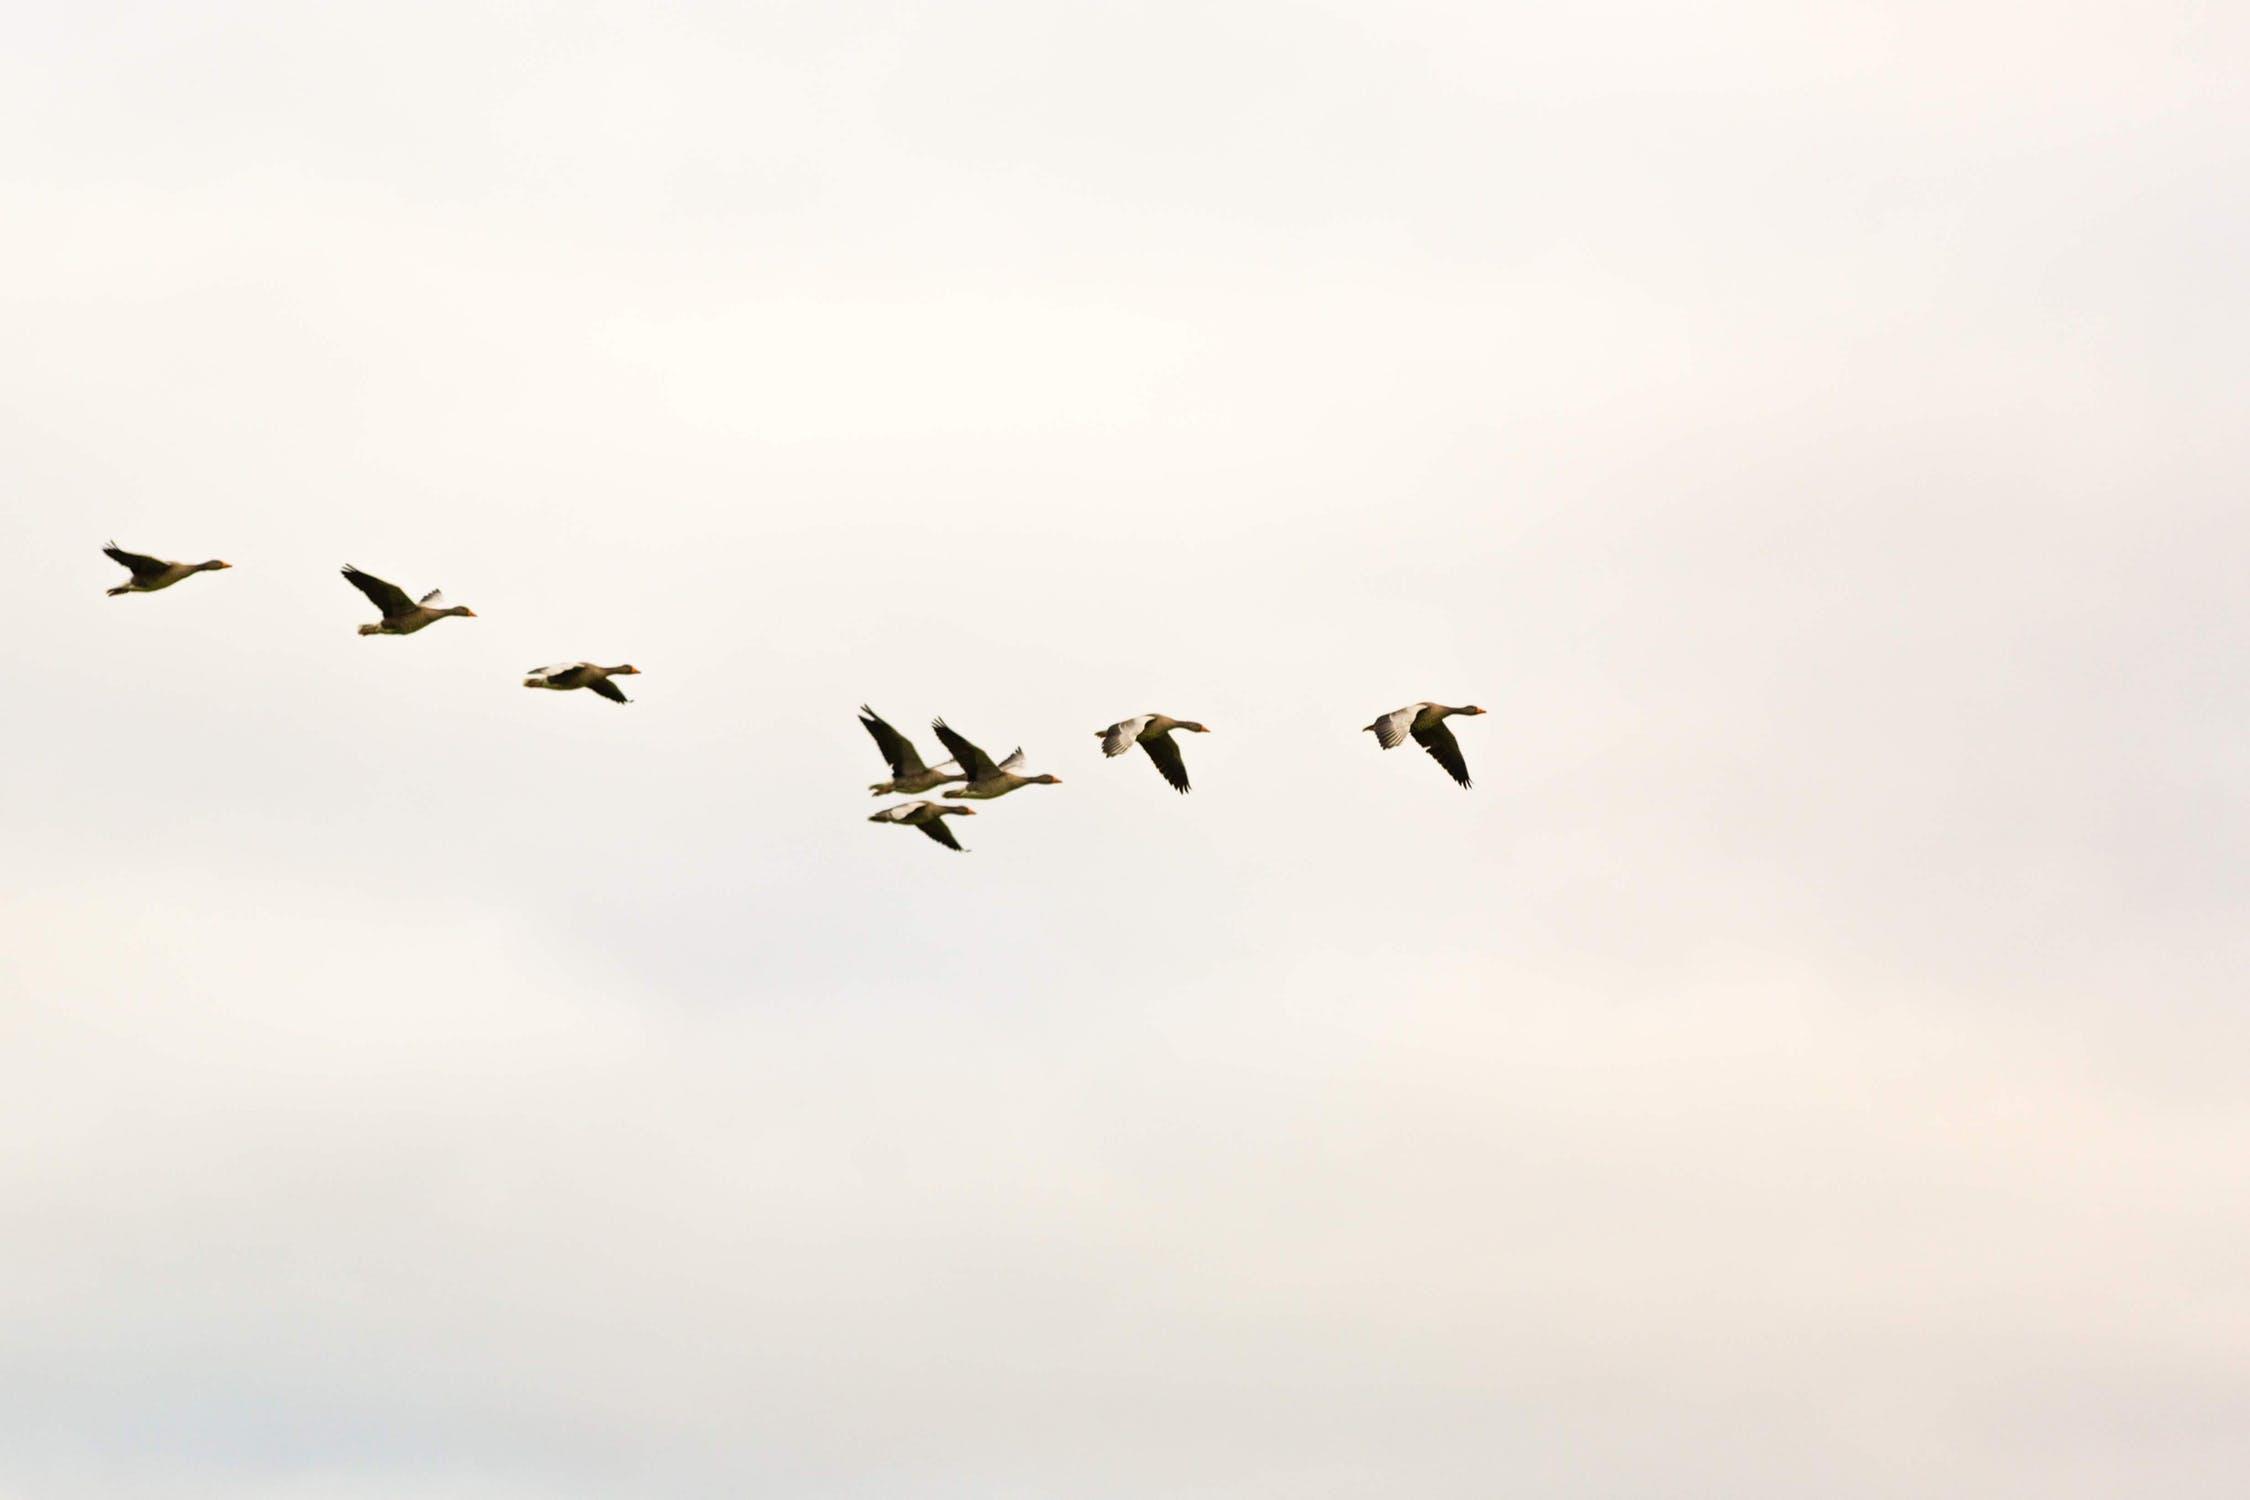 atsb bird strike report